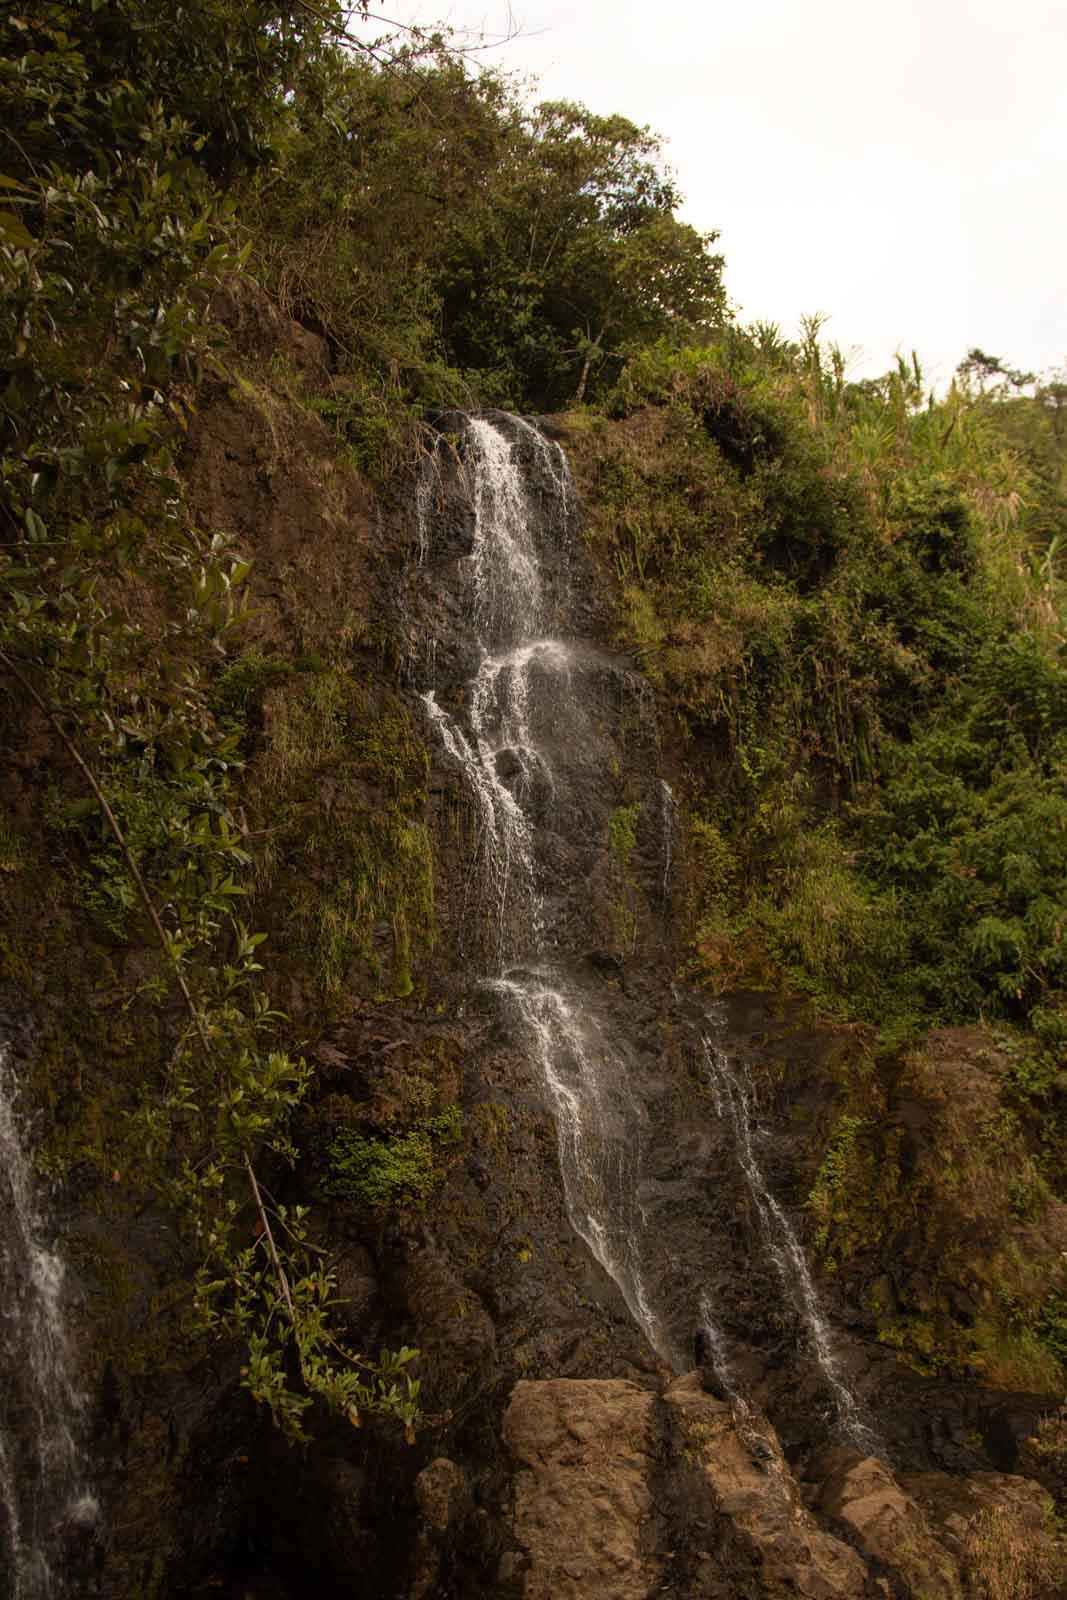 A waterfall in La Cueva de los Guacharos in Jardin, Colombia.